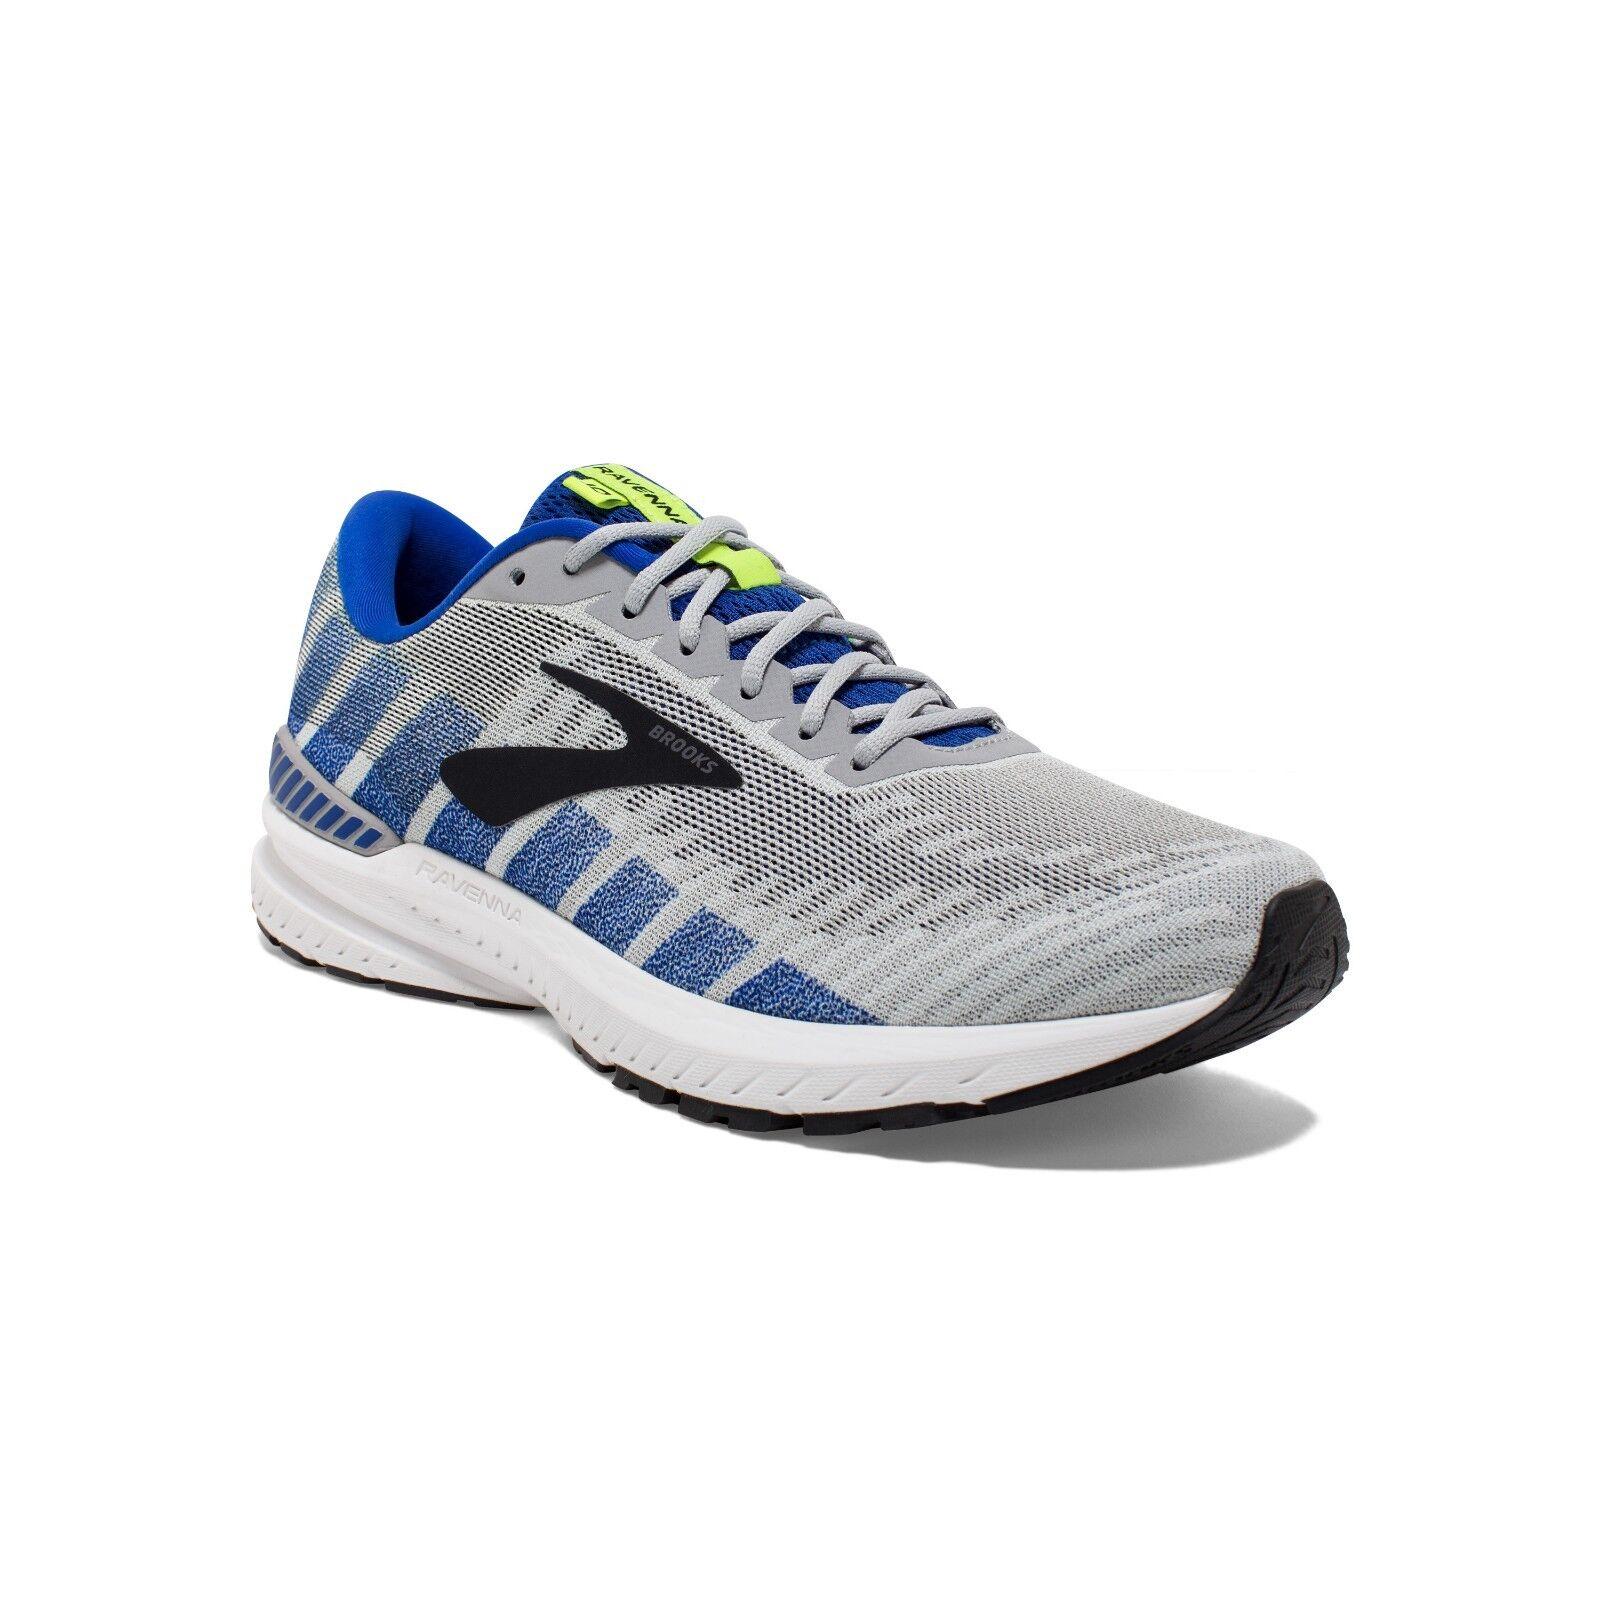 versión más reciente Brooks Ravenna 10 Para Hombre Zapatillas Para Correr (2E) (082)